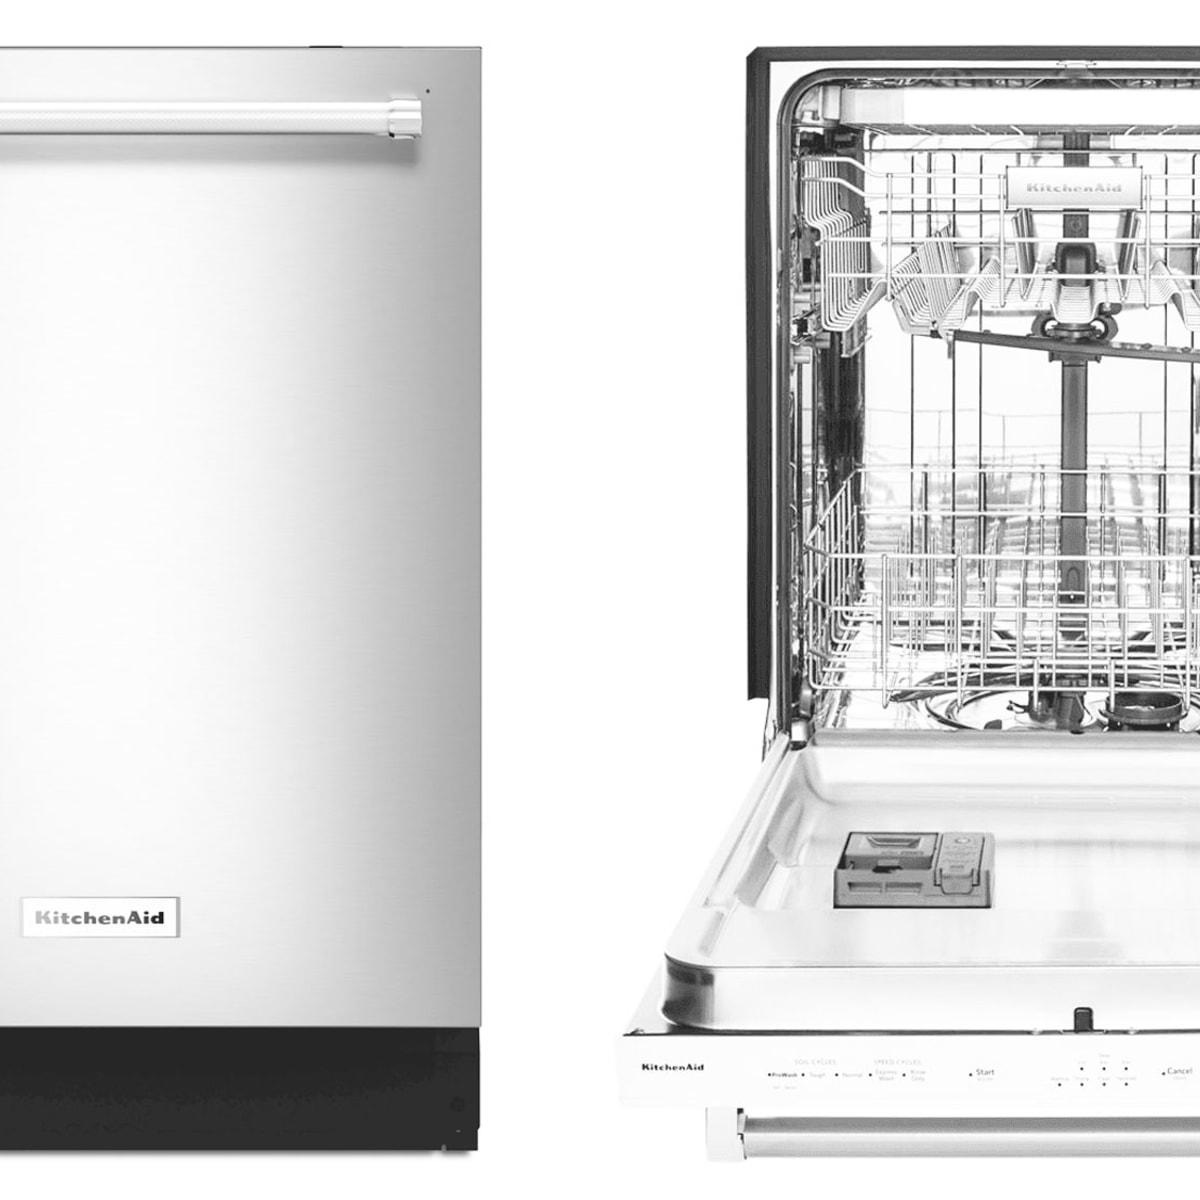 KitchenAid KDTE234GPS Dishwasher Review - Reviewed Dishwashers